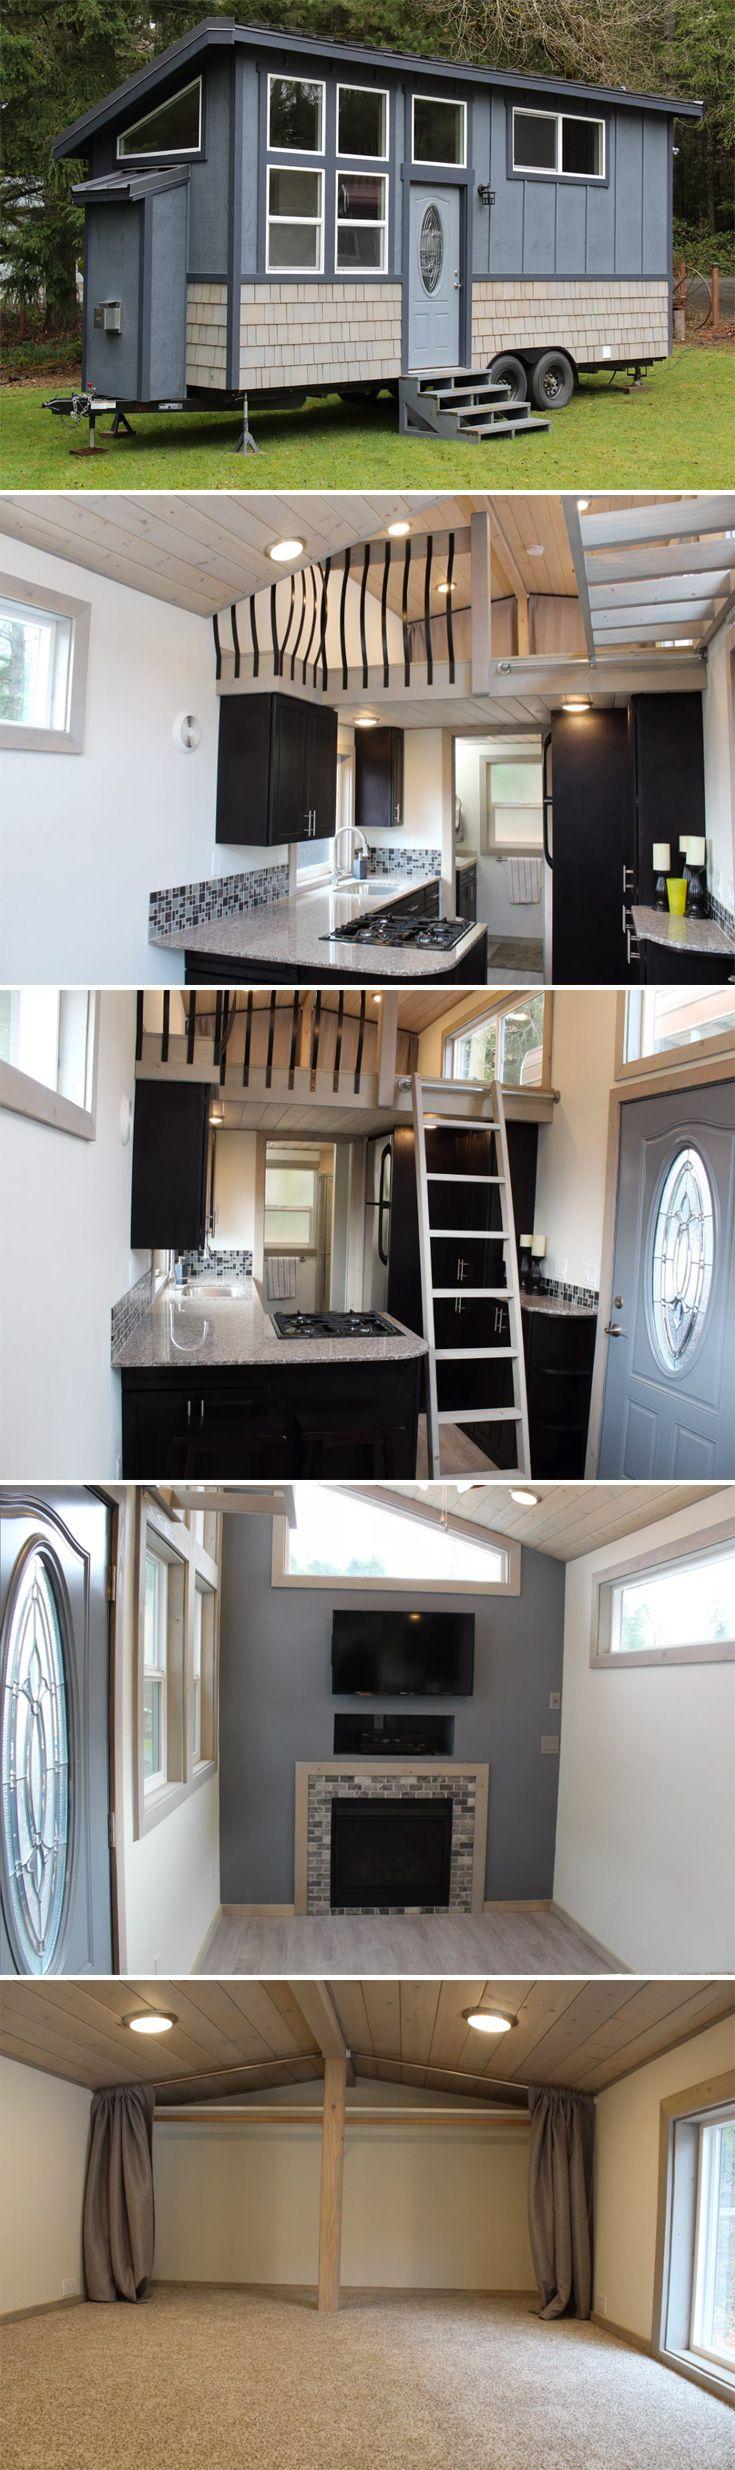 King\'s Loft by Tiny Houses of Washington | Cedar shakes, Batten and ...